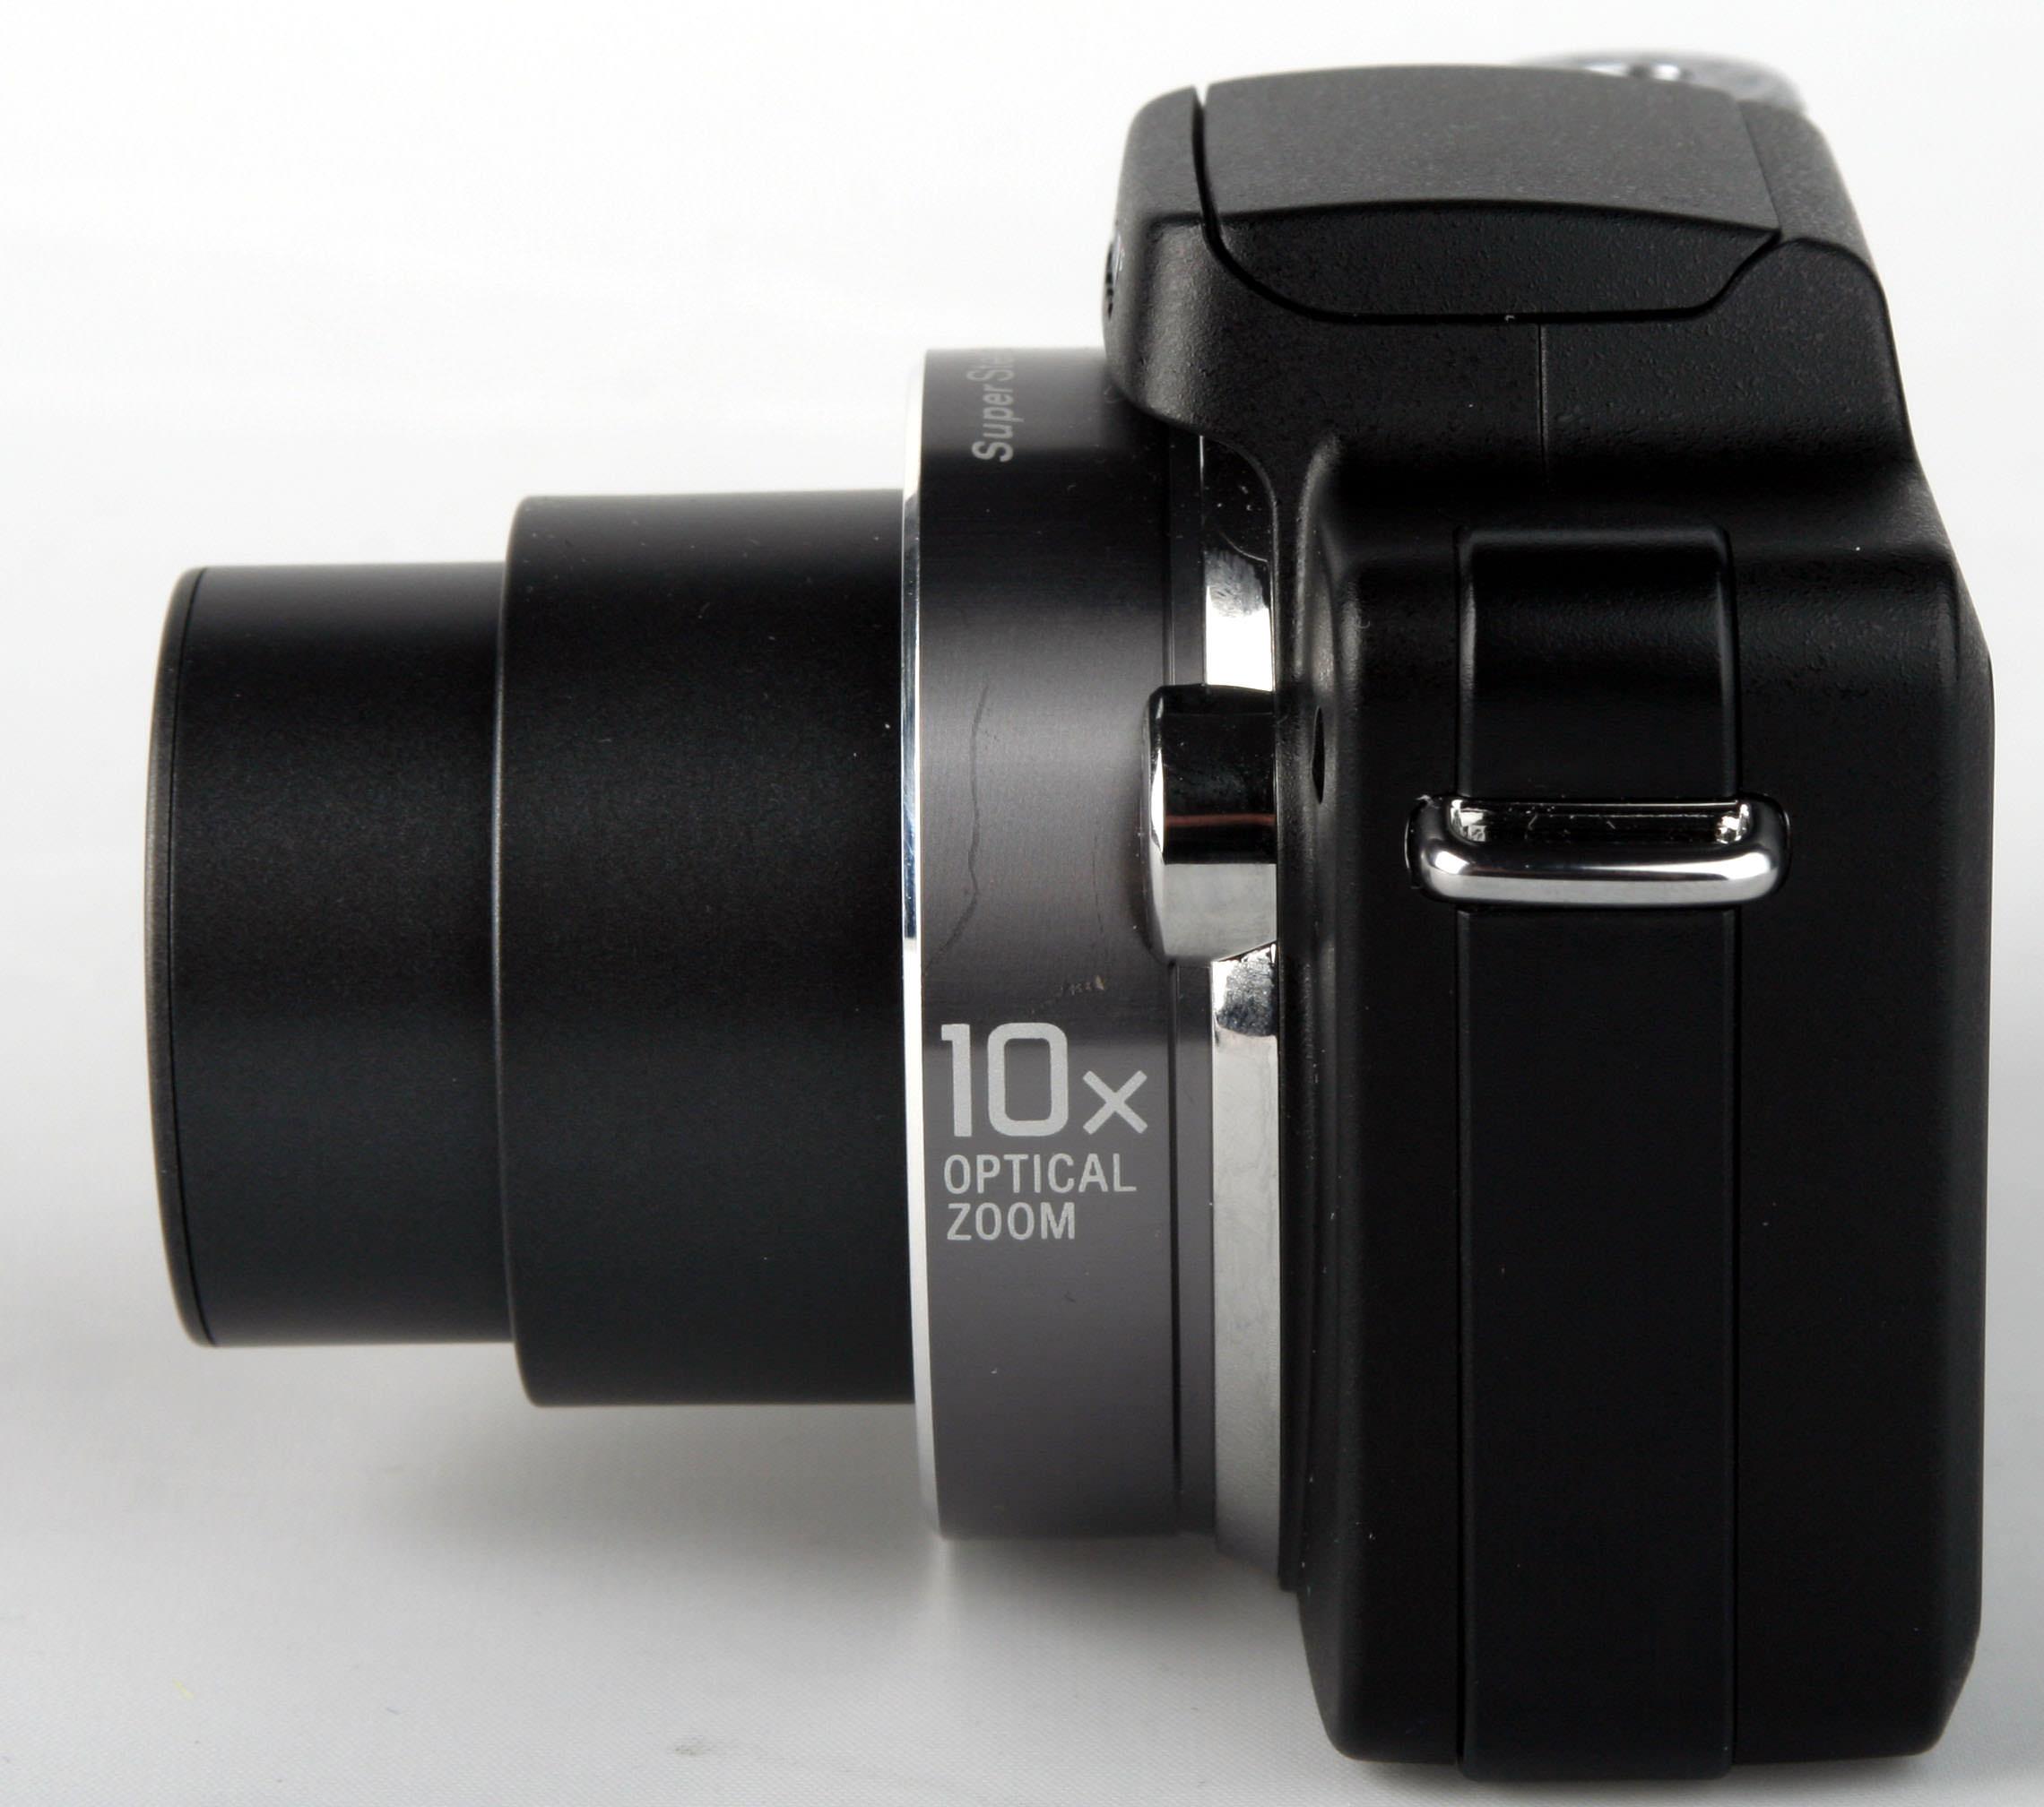 sony dsc h3 digital camera review rh ephotozine com sony j-h3 manual sony j-h3 manual